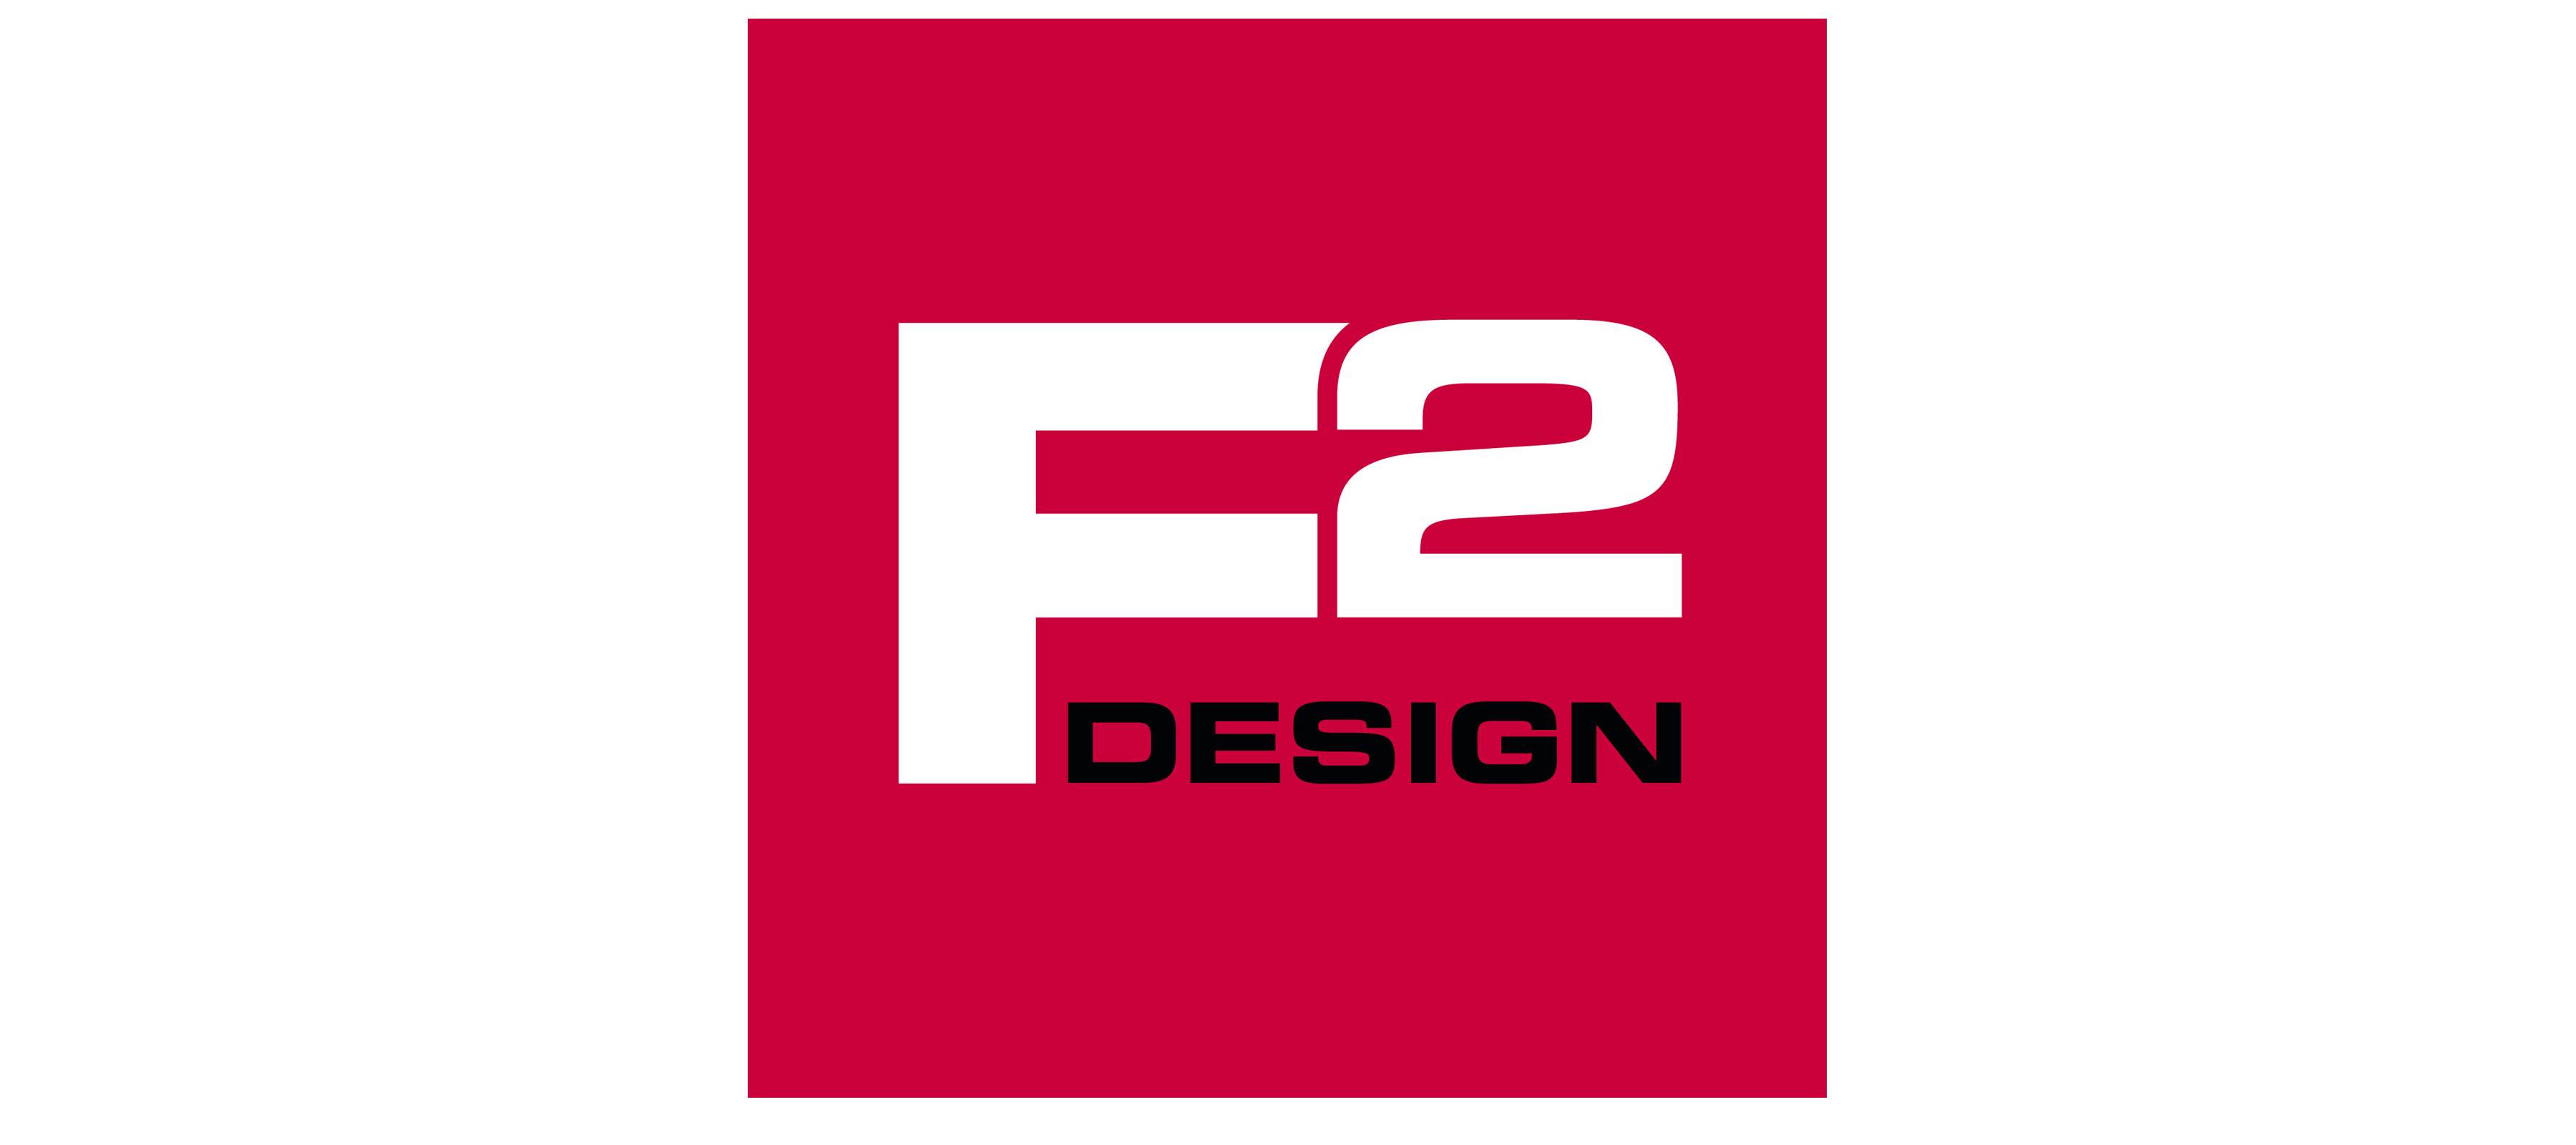 F2 Design Werbeagentur Augsburg F2 Design Startbild 2